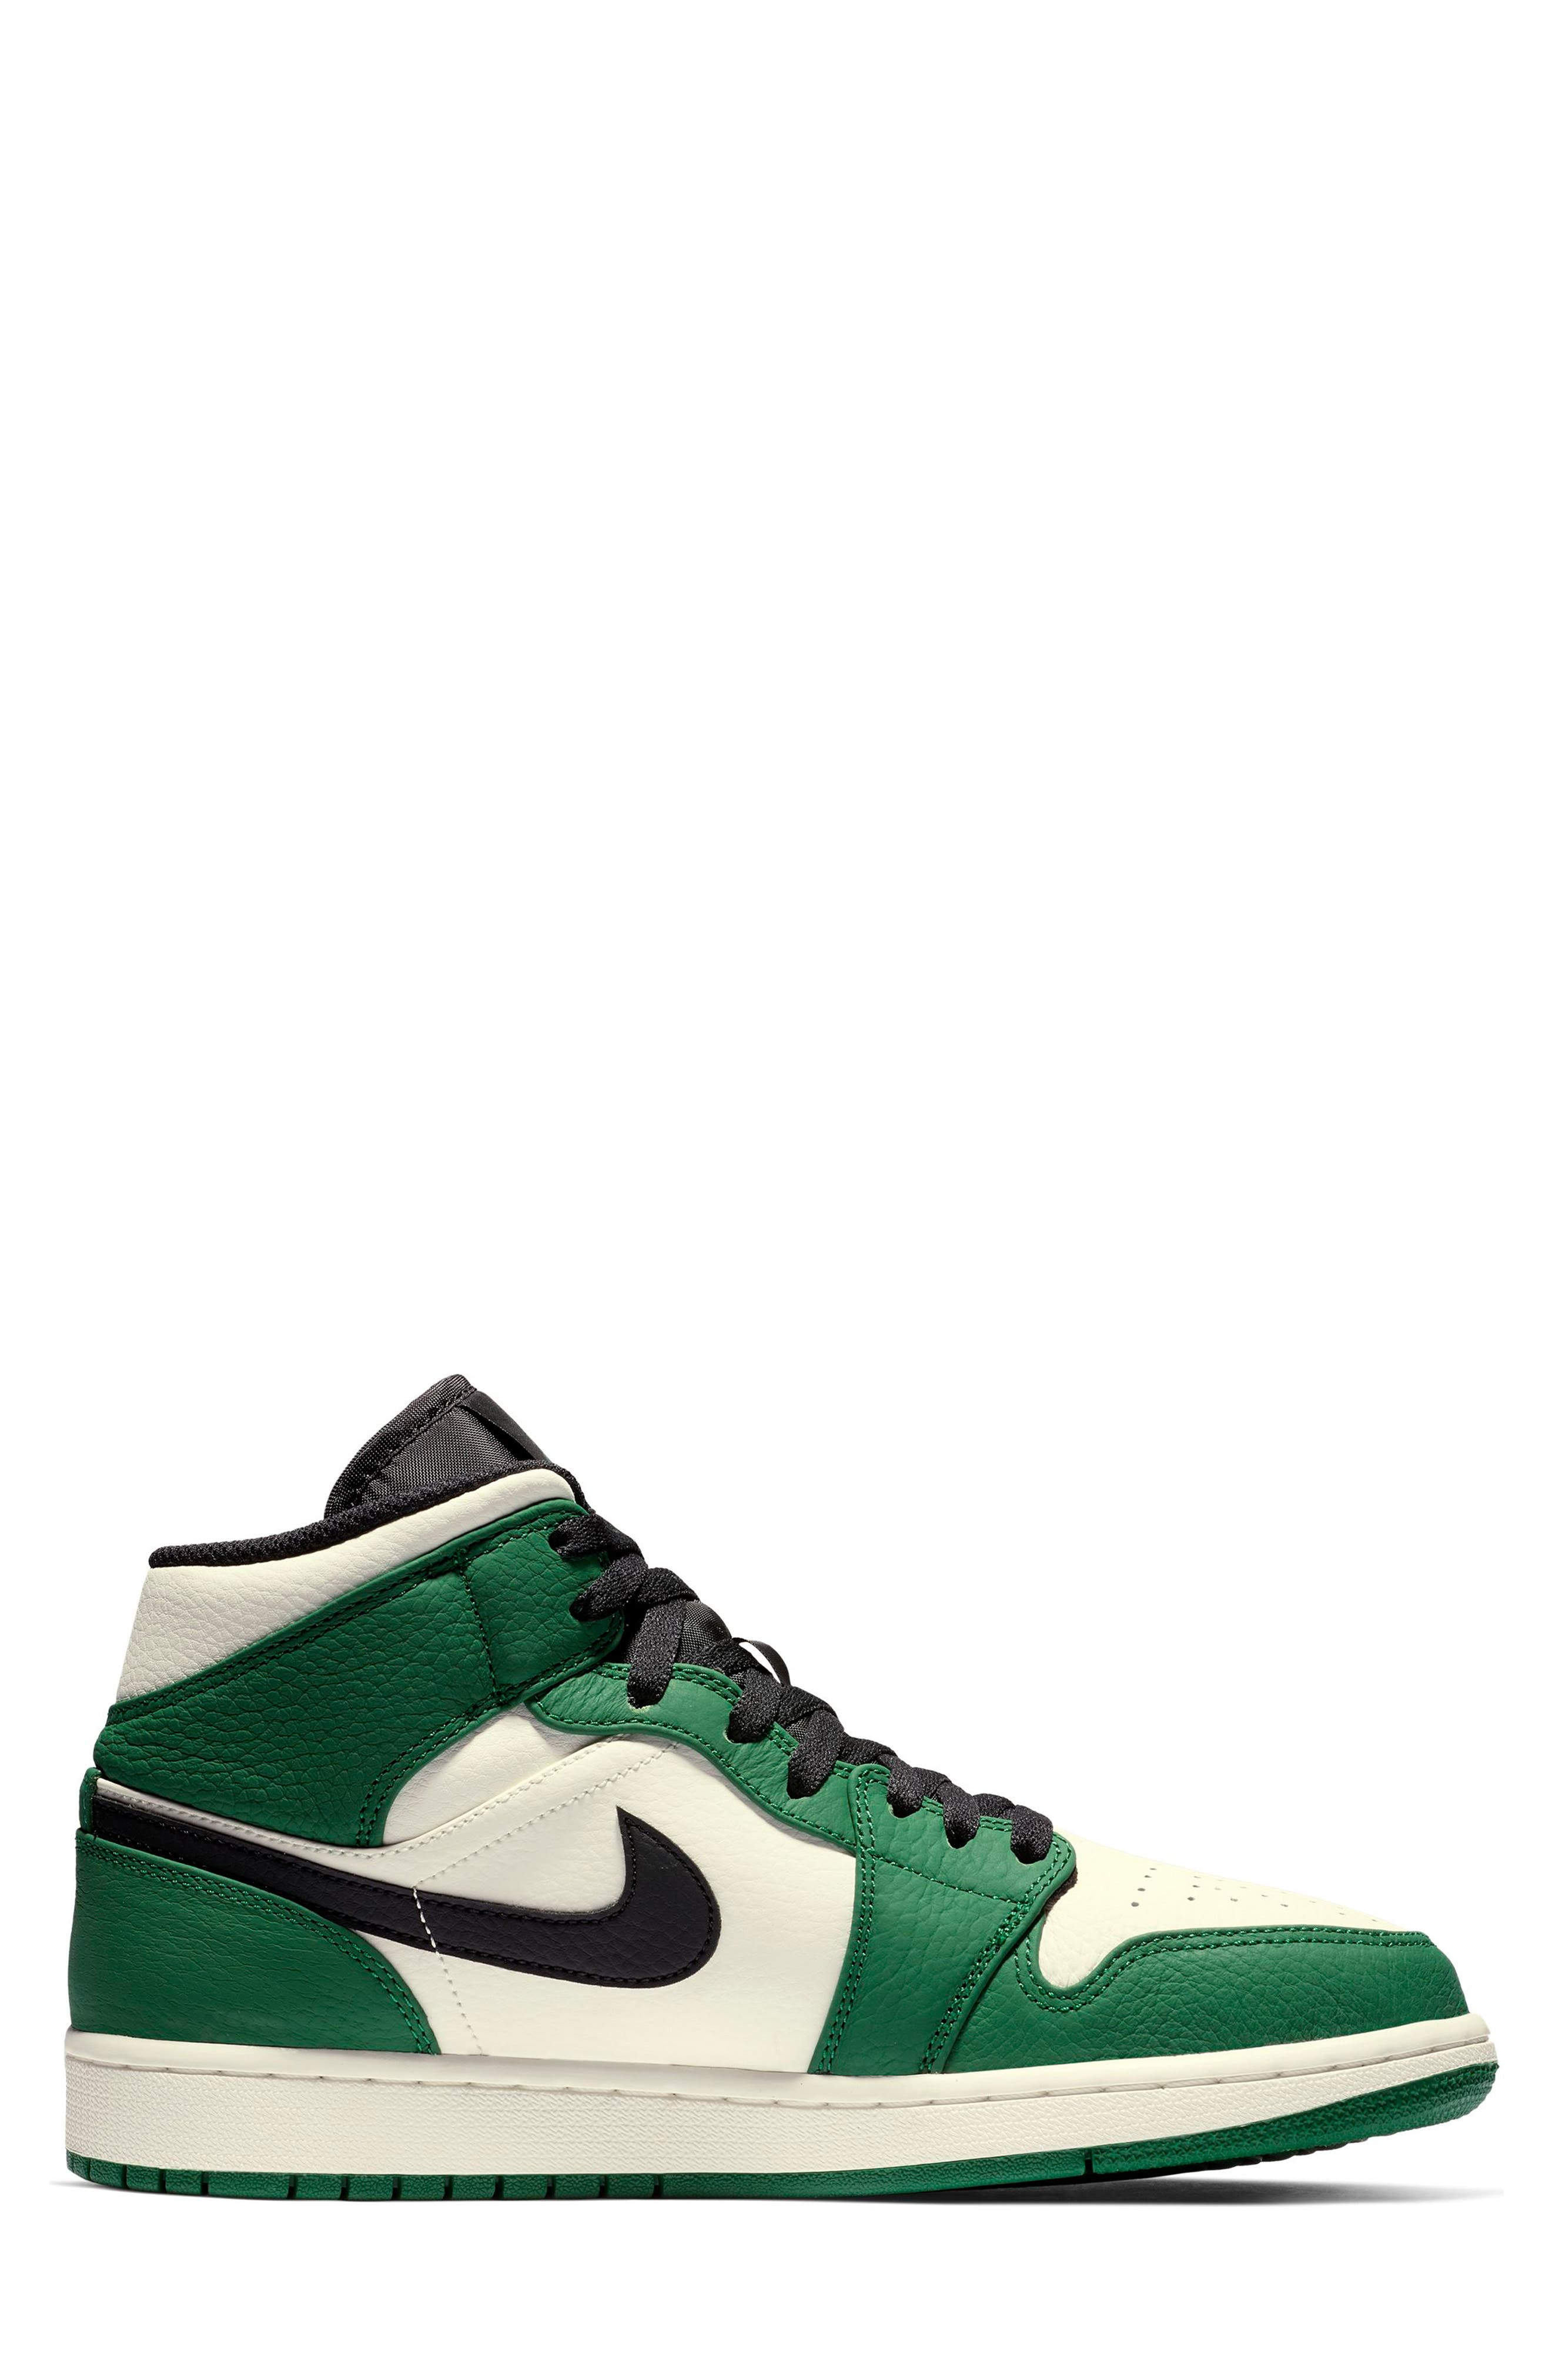 NIKE, Air Jordan 1 Mid Winterized Sneaker, Alternate thumbnail 2, color, 301